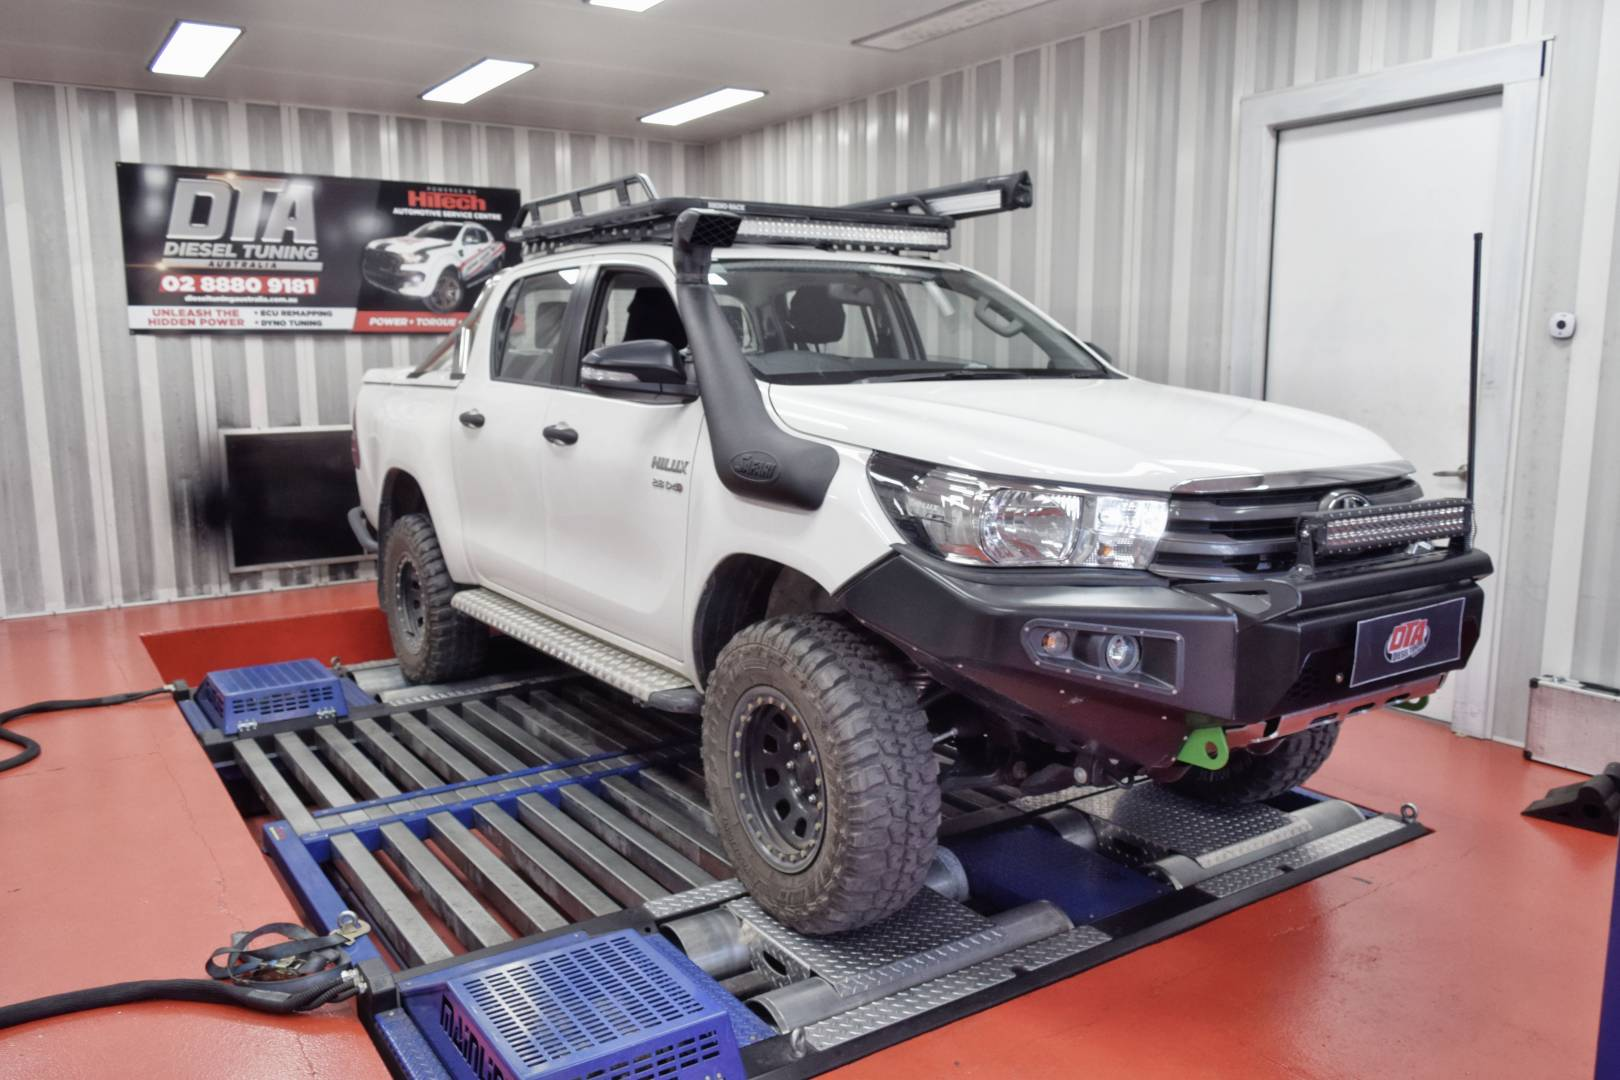 Mazda Bt 50 2016 Tuning >> Hilux 2017 D4D Auto tuning - Diesel Tuning Australia